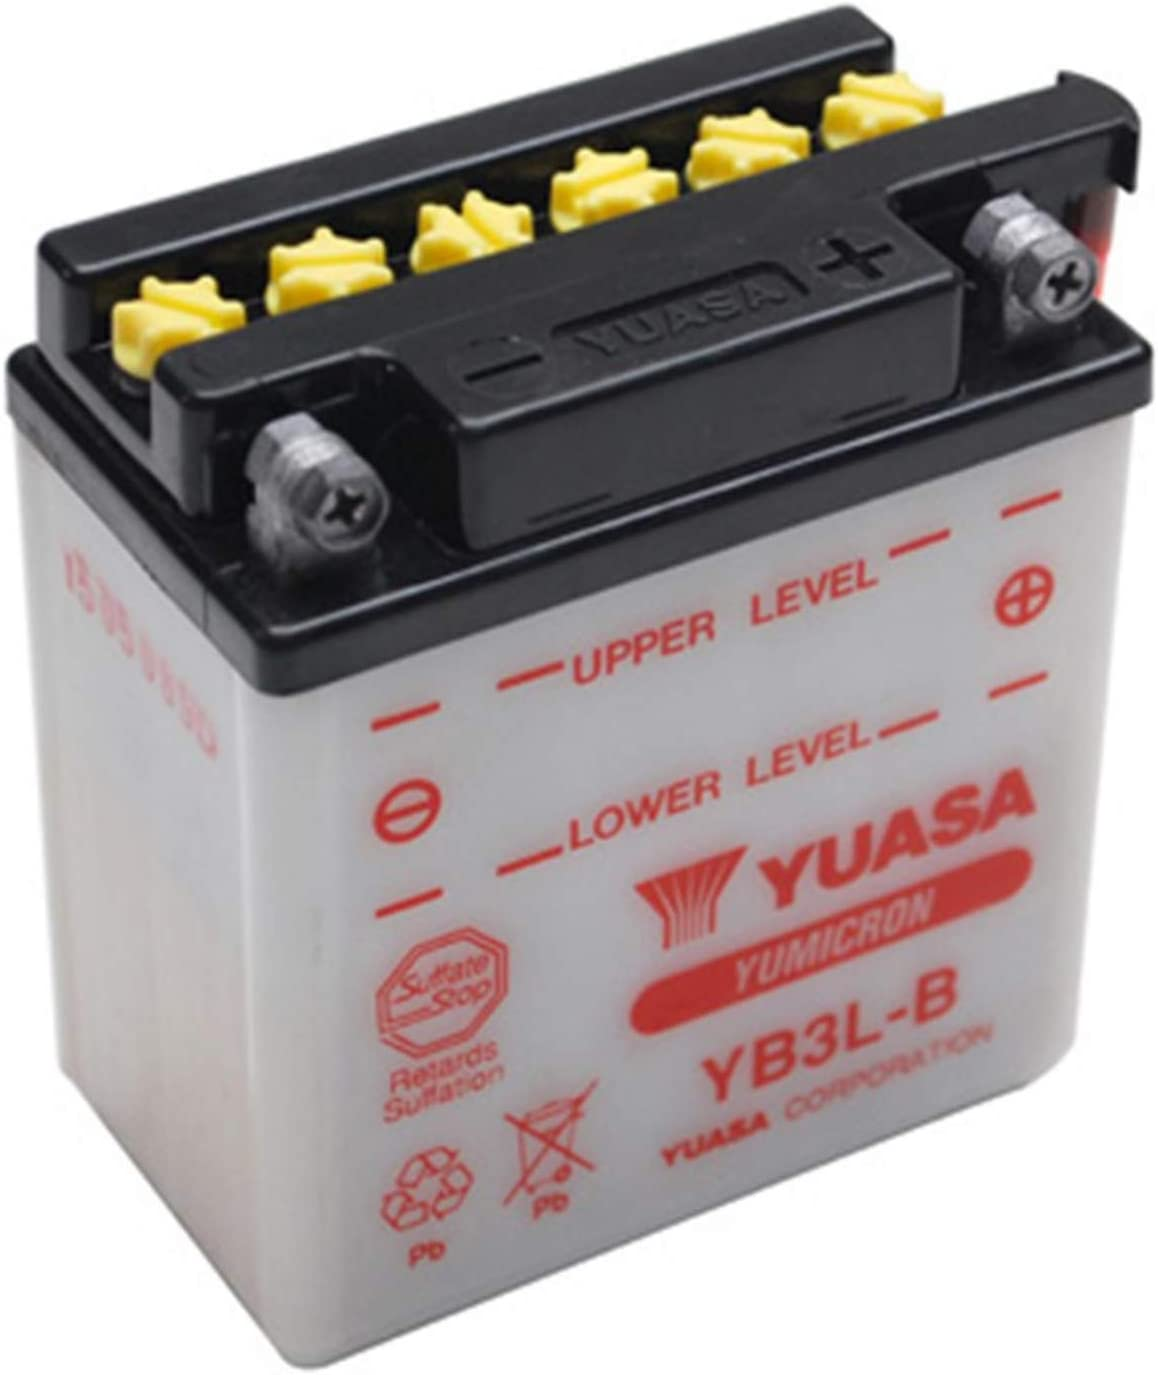 Yuasa Yb3l B Y Batterie Yb3l B Offen Ohne Saeure Auto